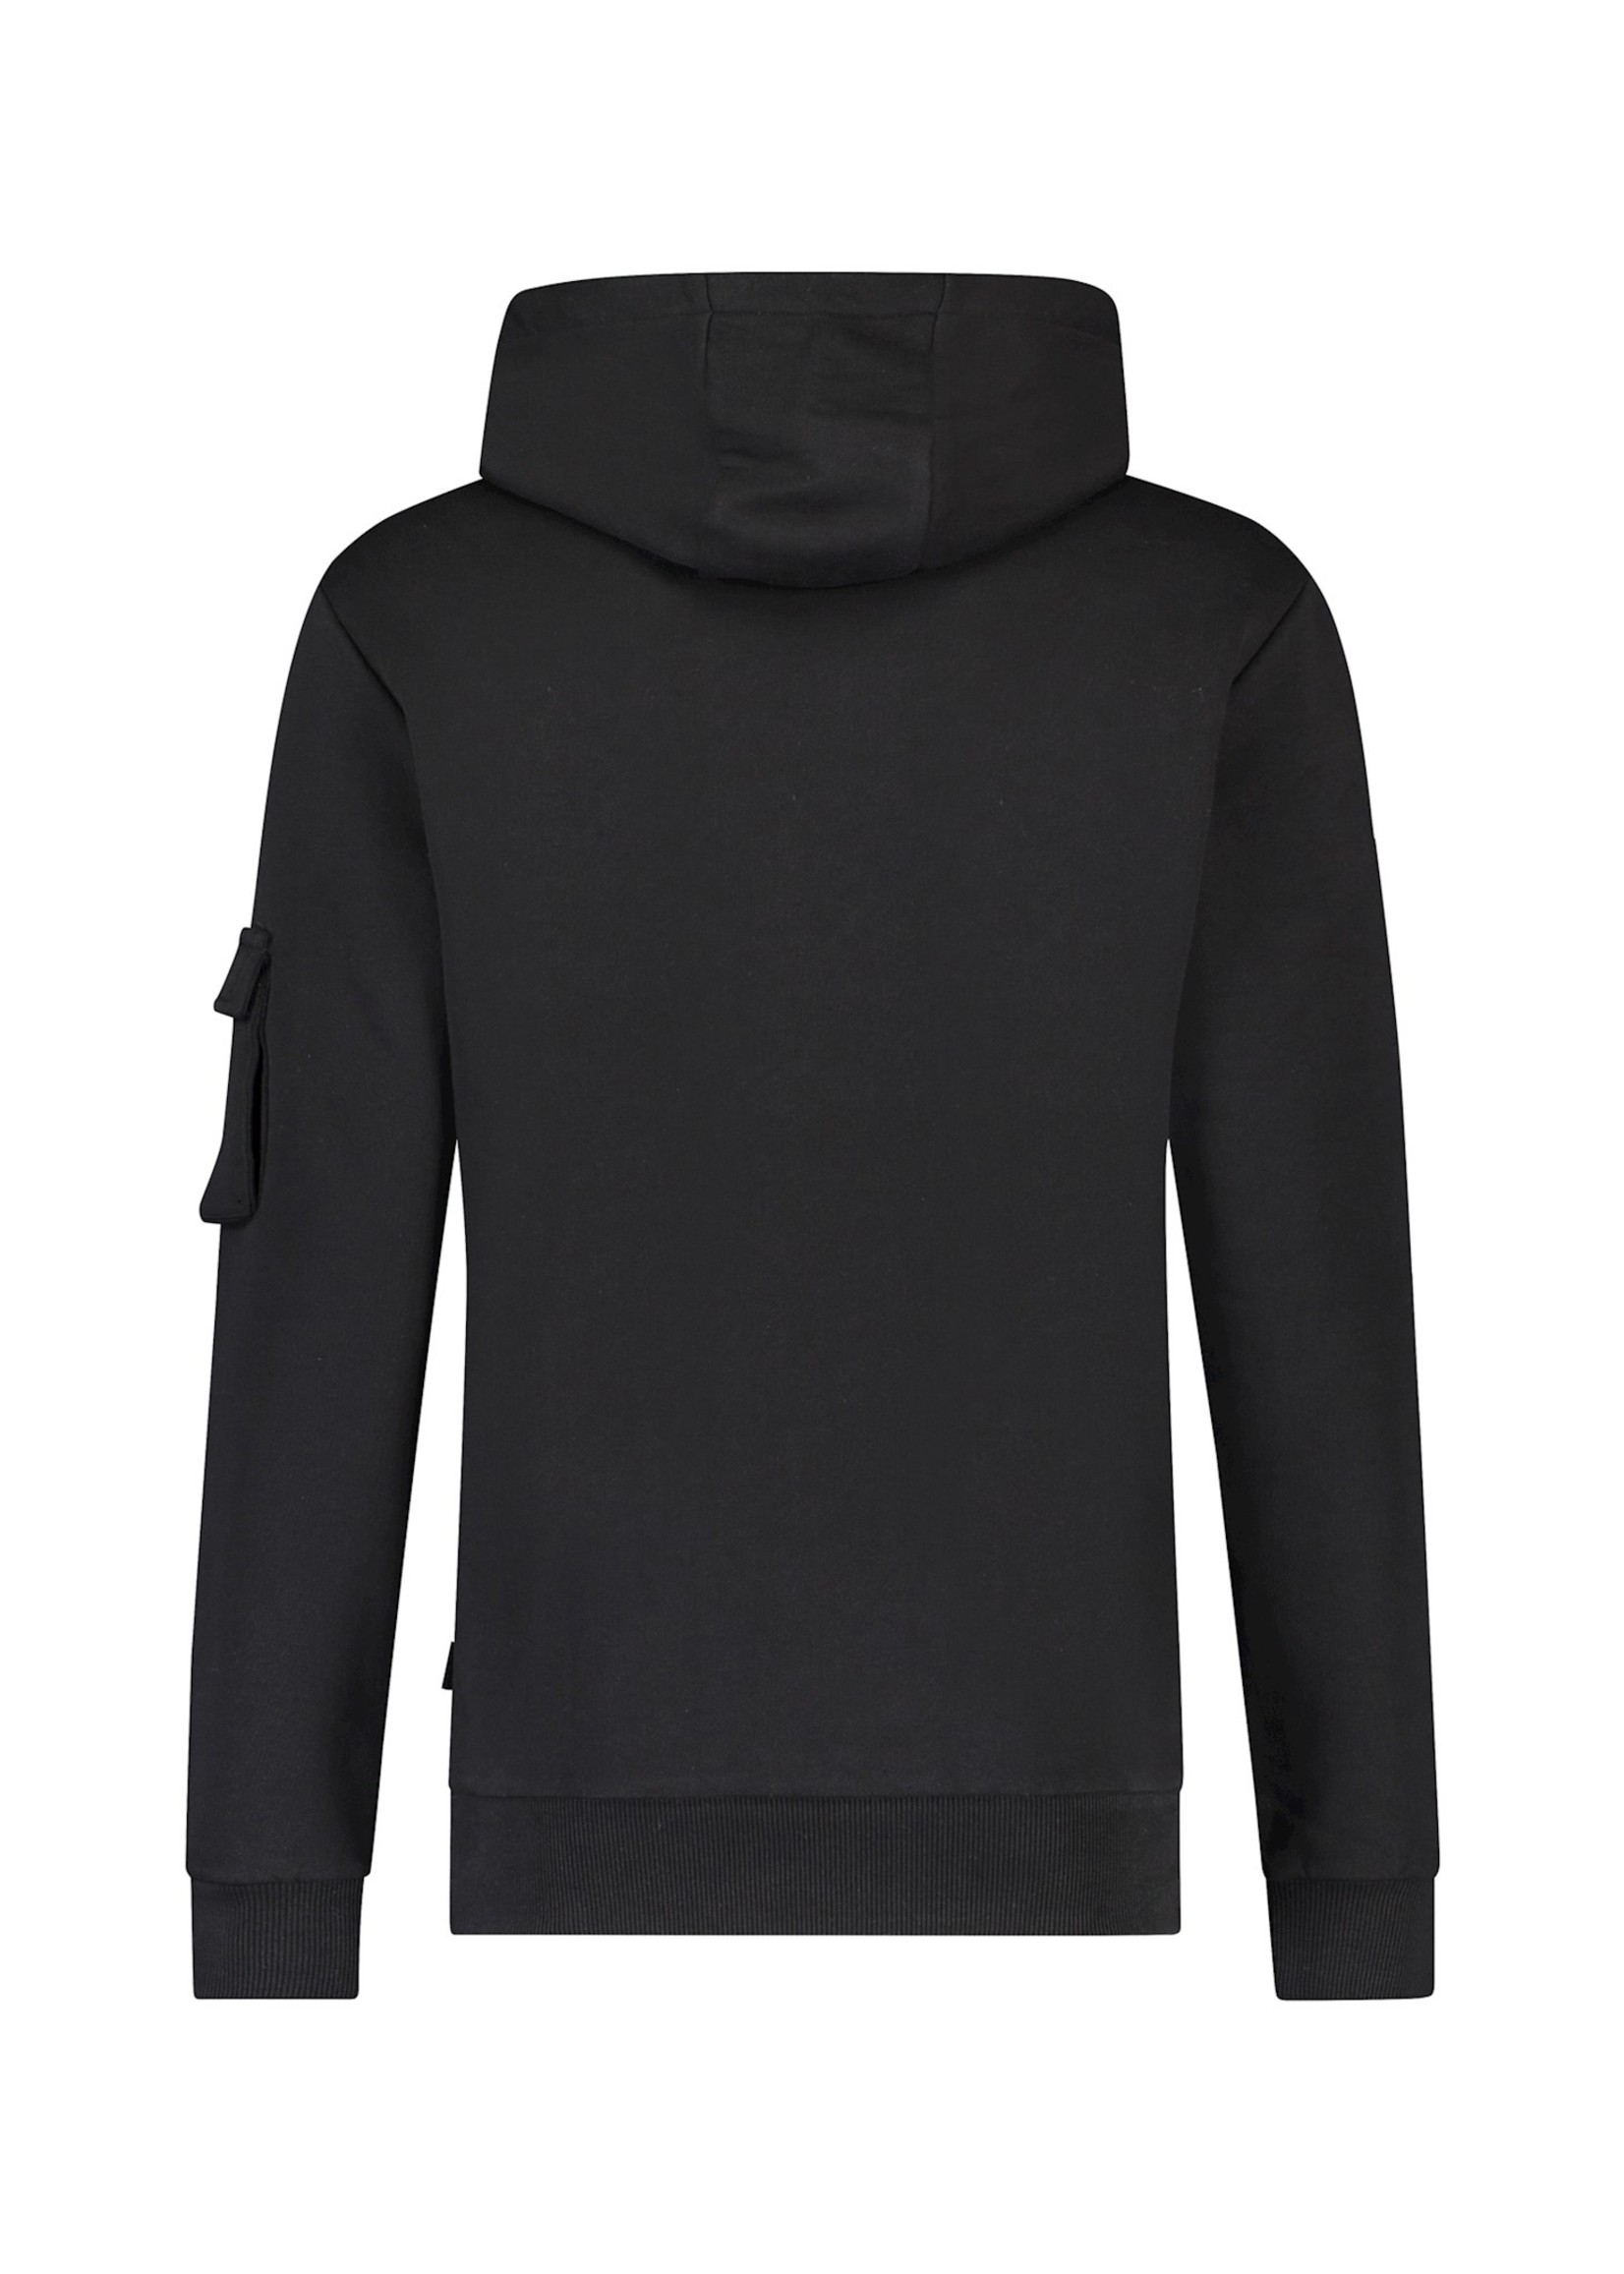 Purewhite Utility Pocket Hoodie - Black